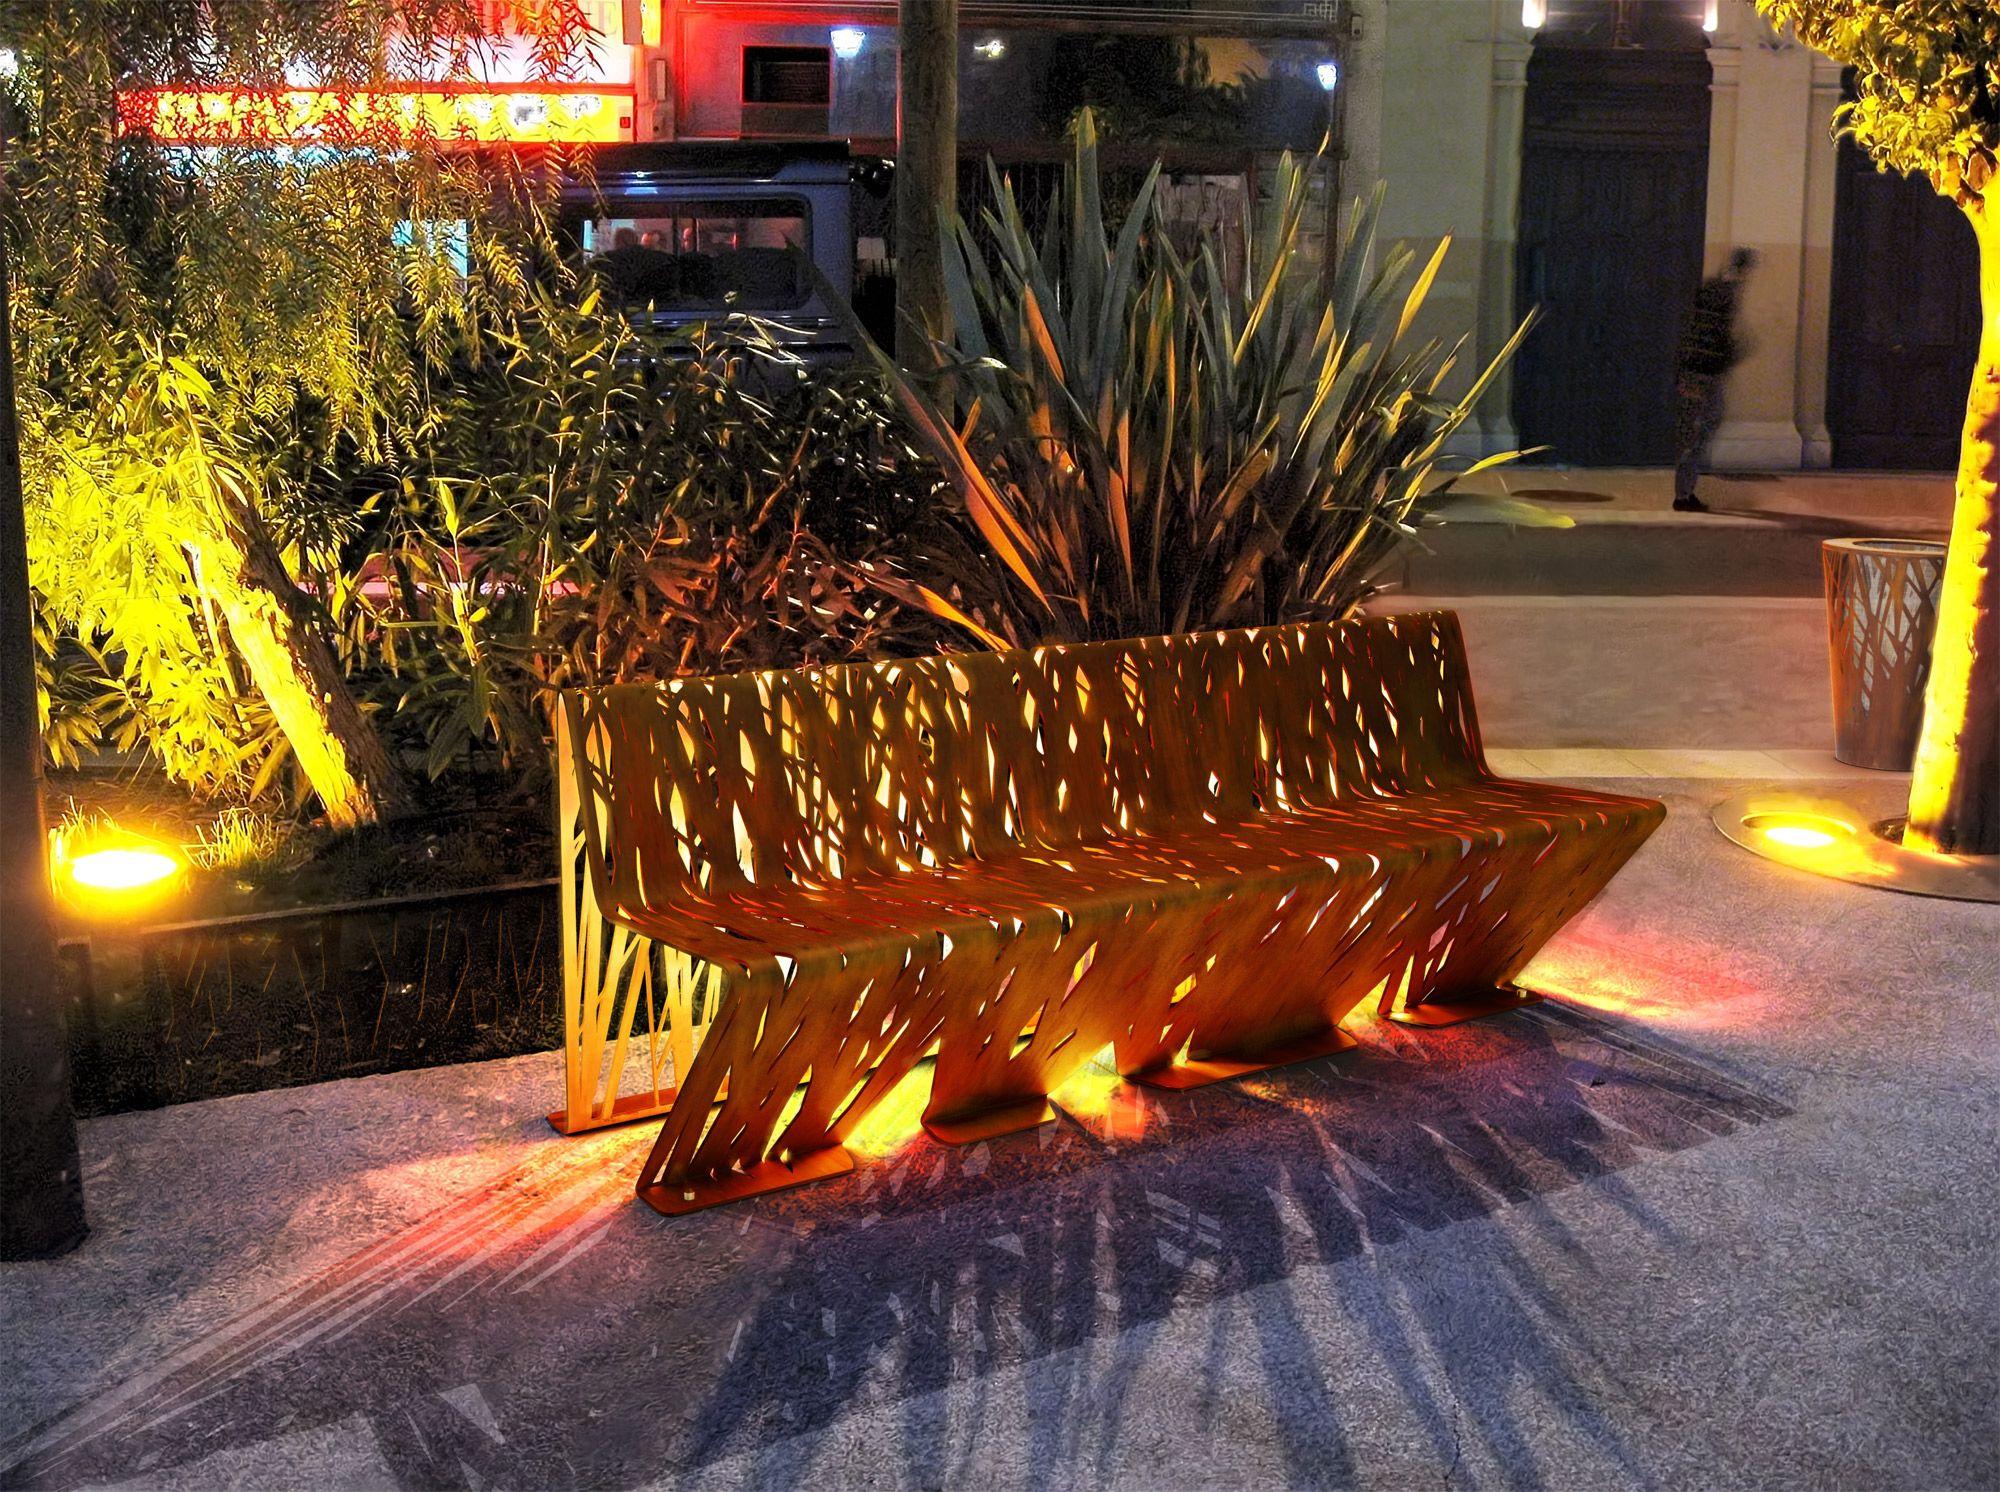 Urban Design Furniture art 4 logic: urban design street furniturelab23 | mobiliario